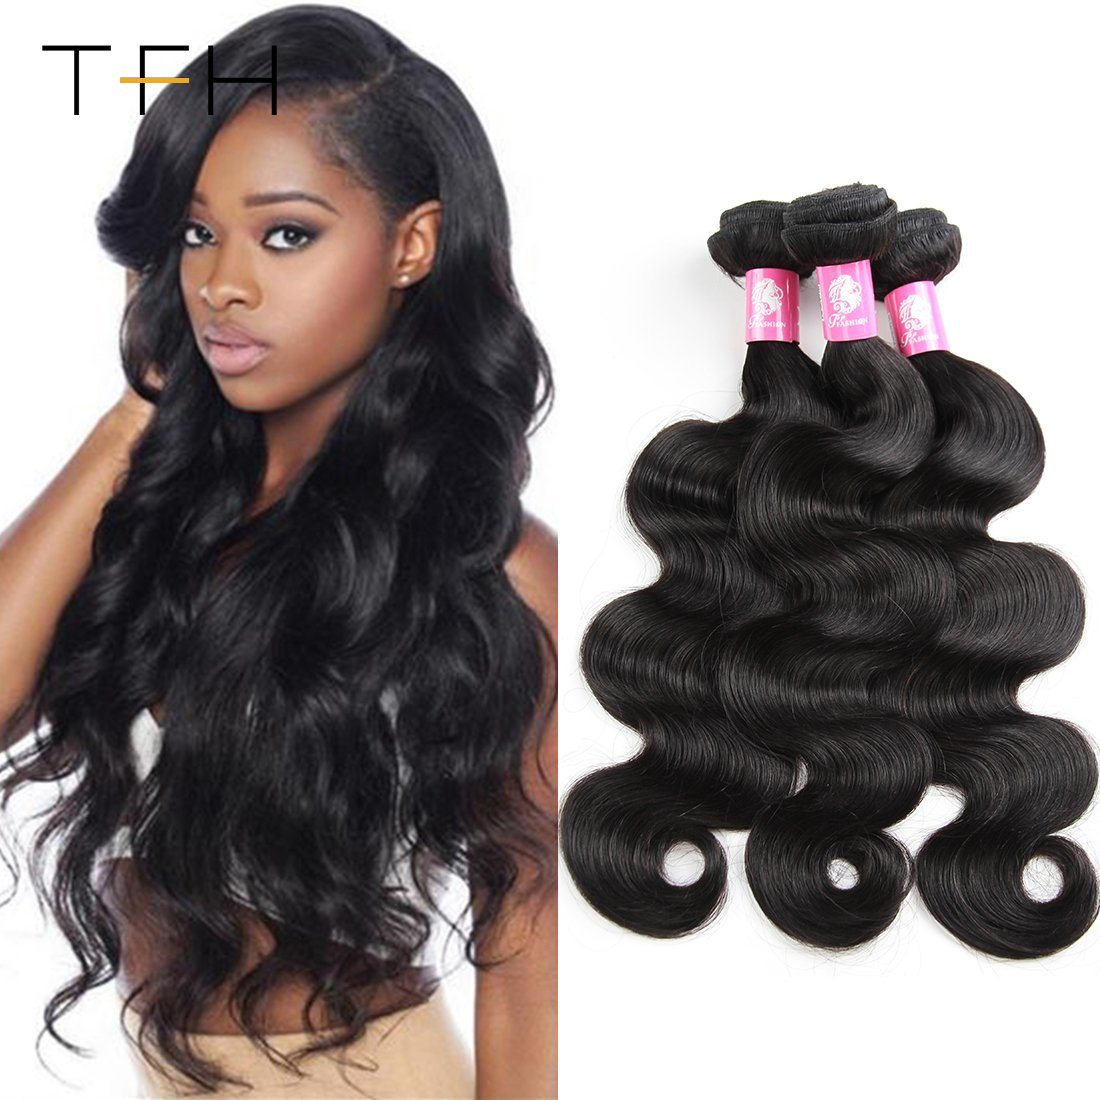 China Top Fashion Hair 3 Bundles Brazilian Body Wave Double Weft